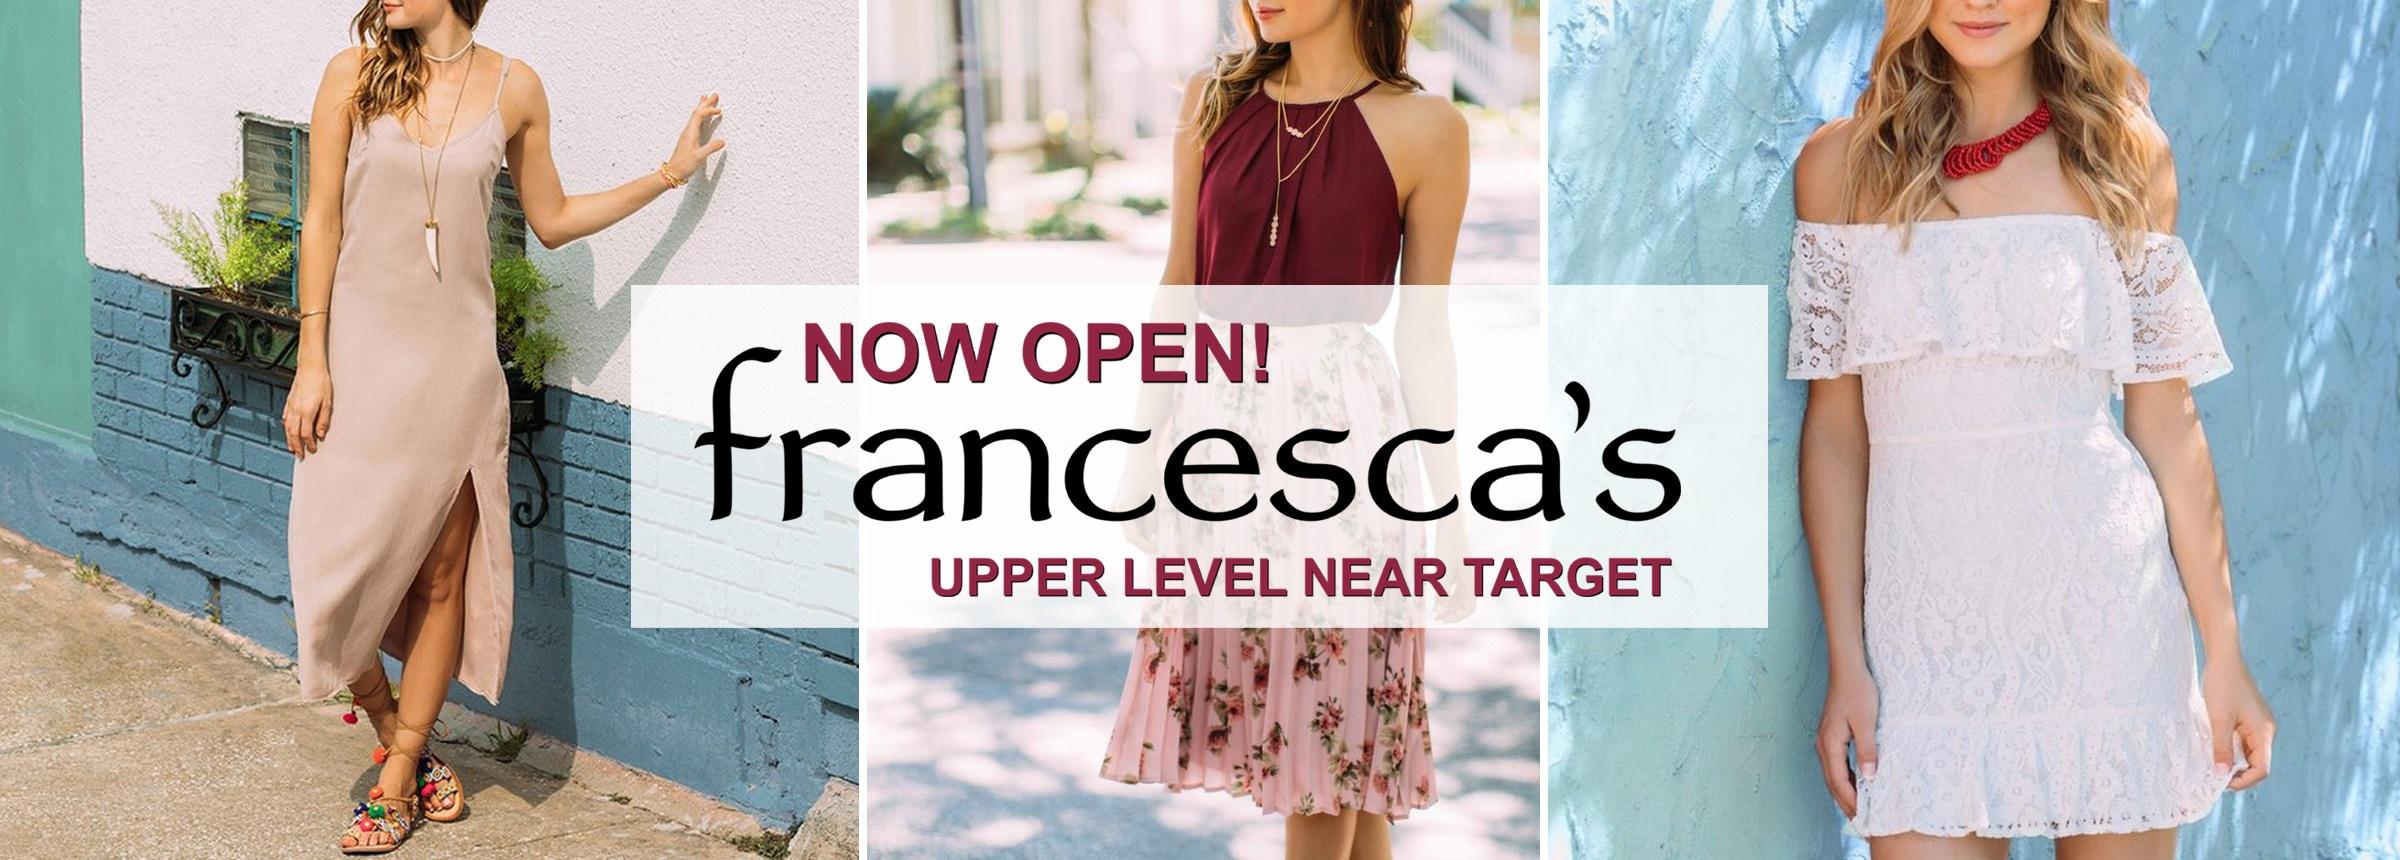 Francesca's Now Open - Upper Level Near Target